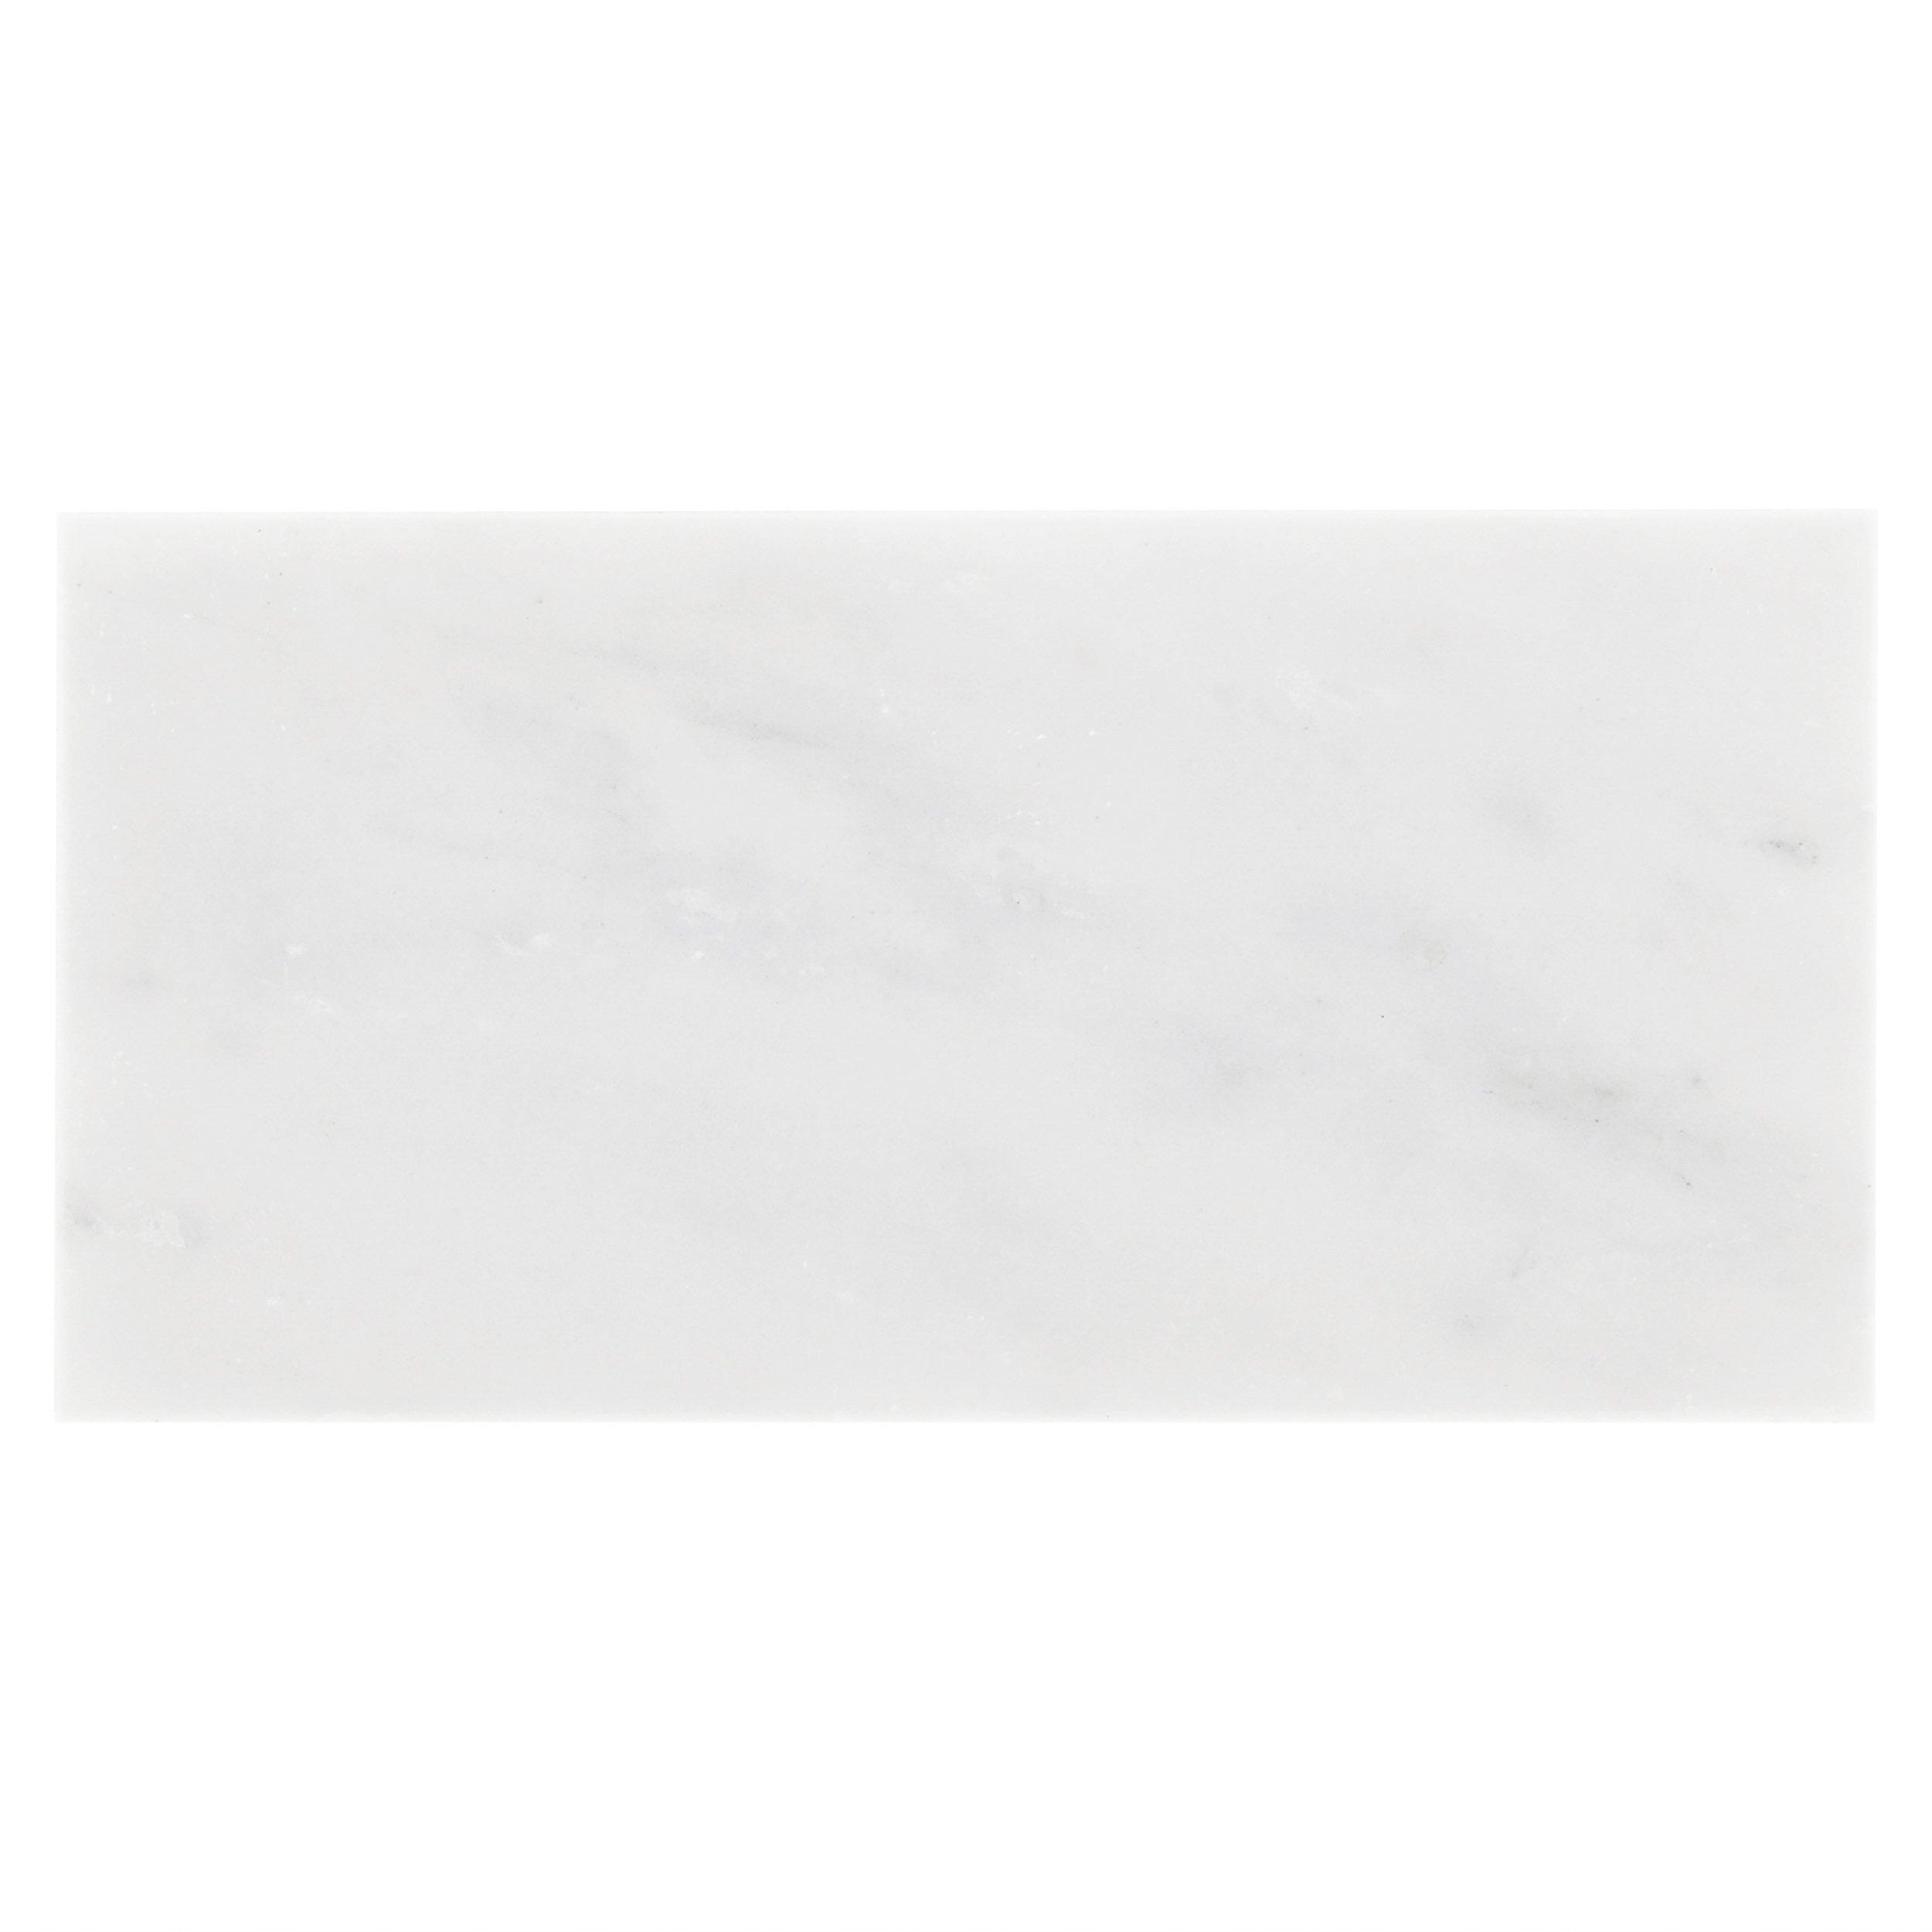 Carrara White Honed Marble Tile 3 X 6 931100279 Floor And Decor